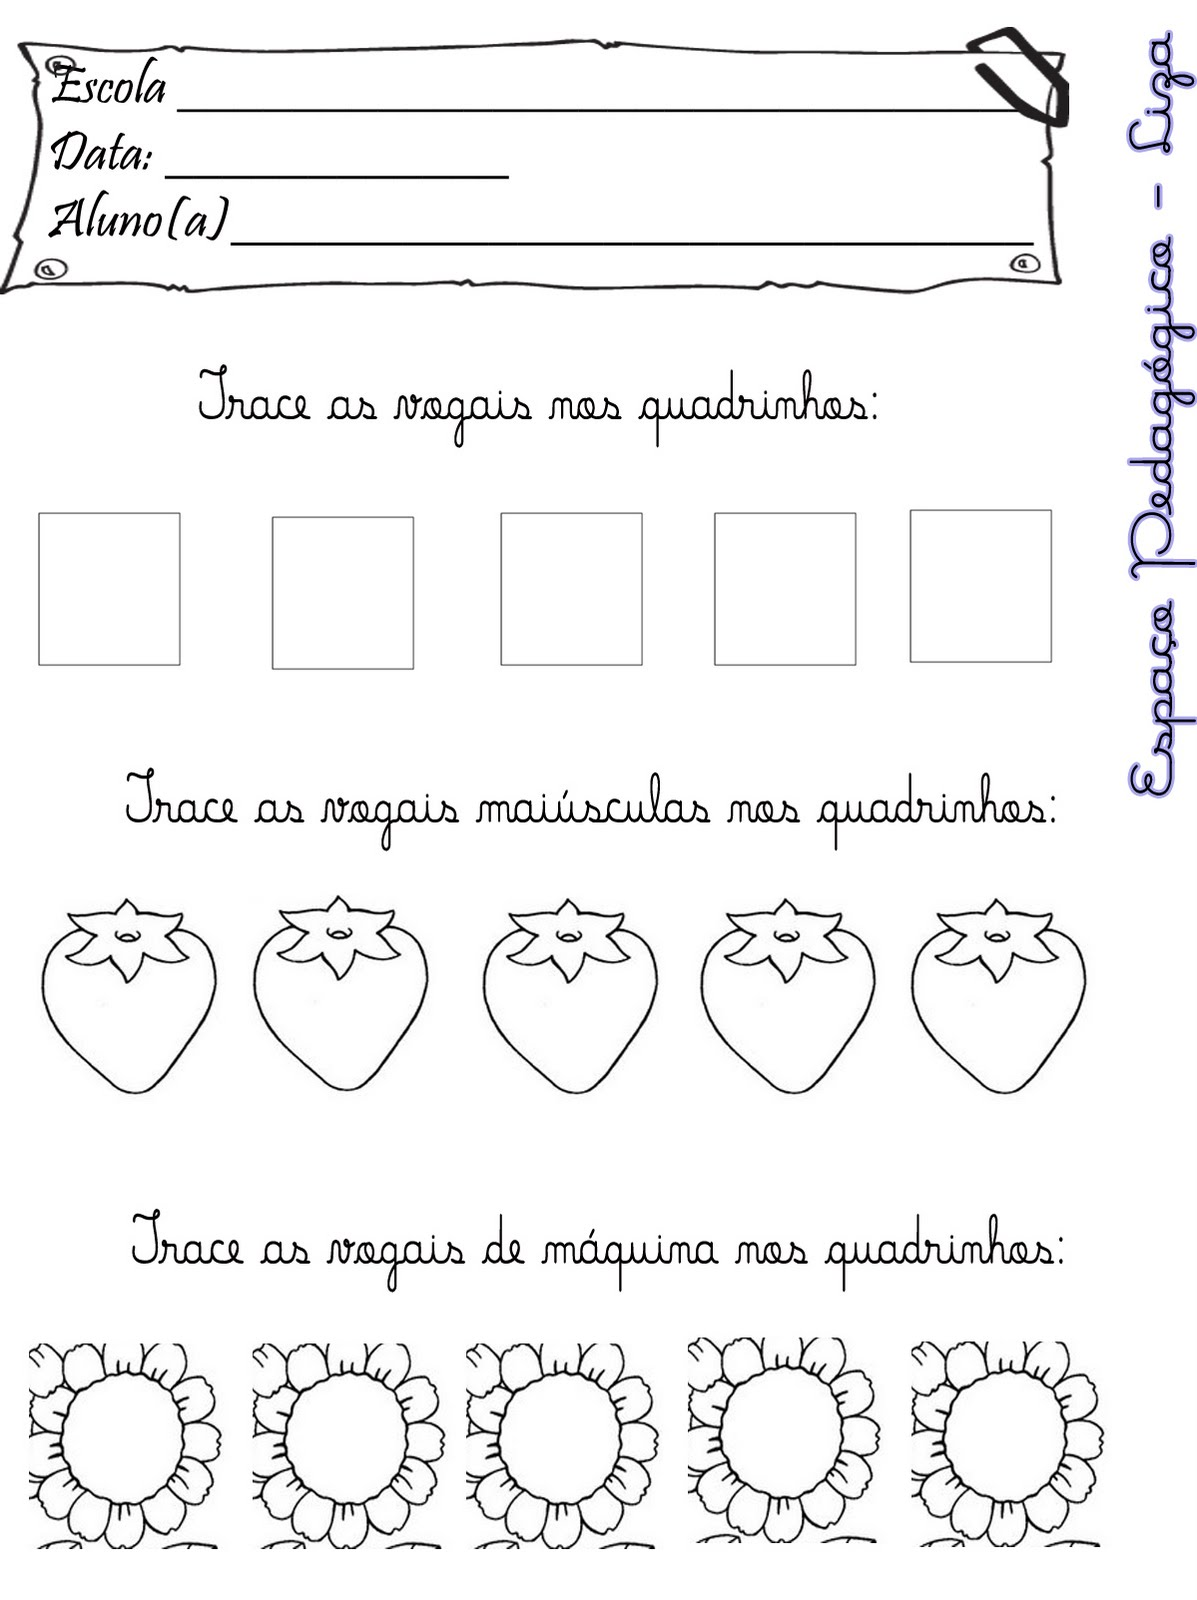 Credito  Espa  O Pedagogico